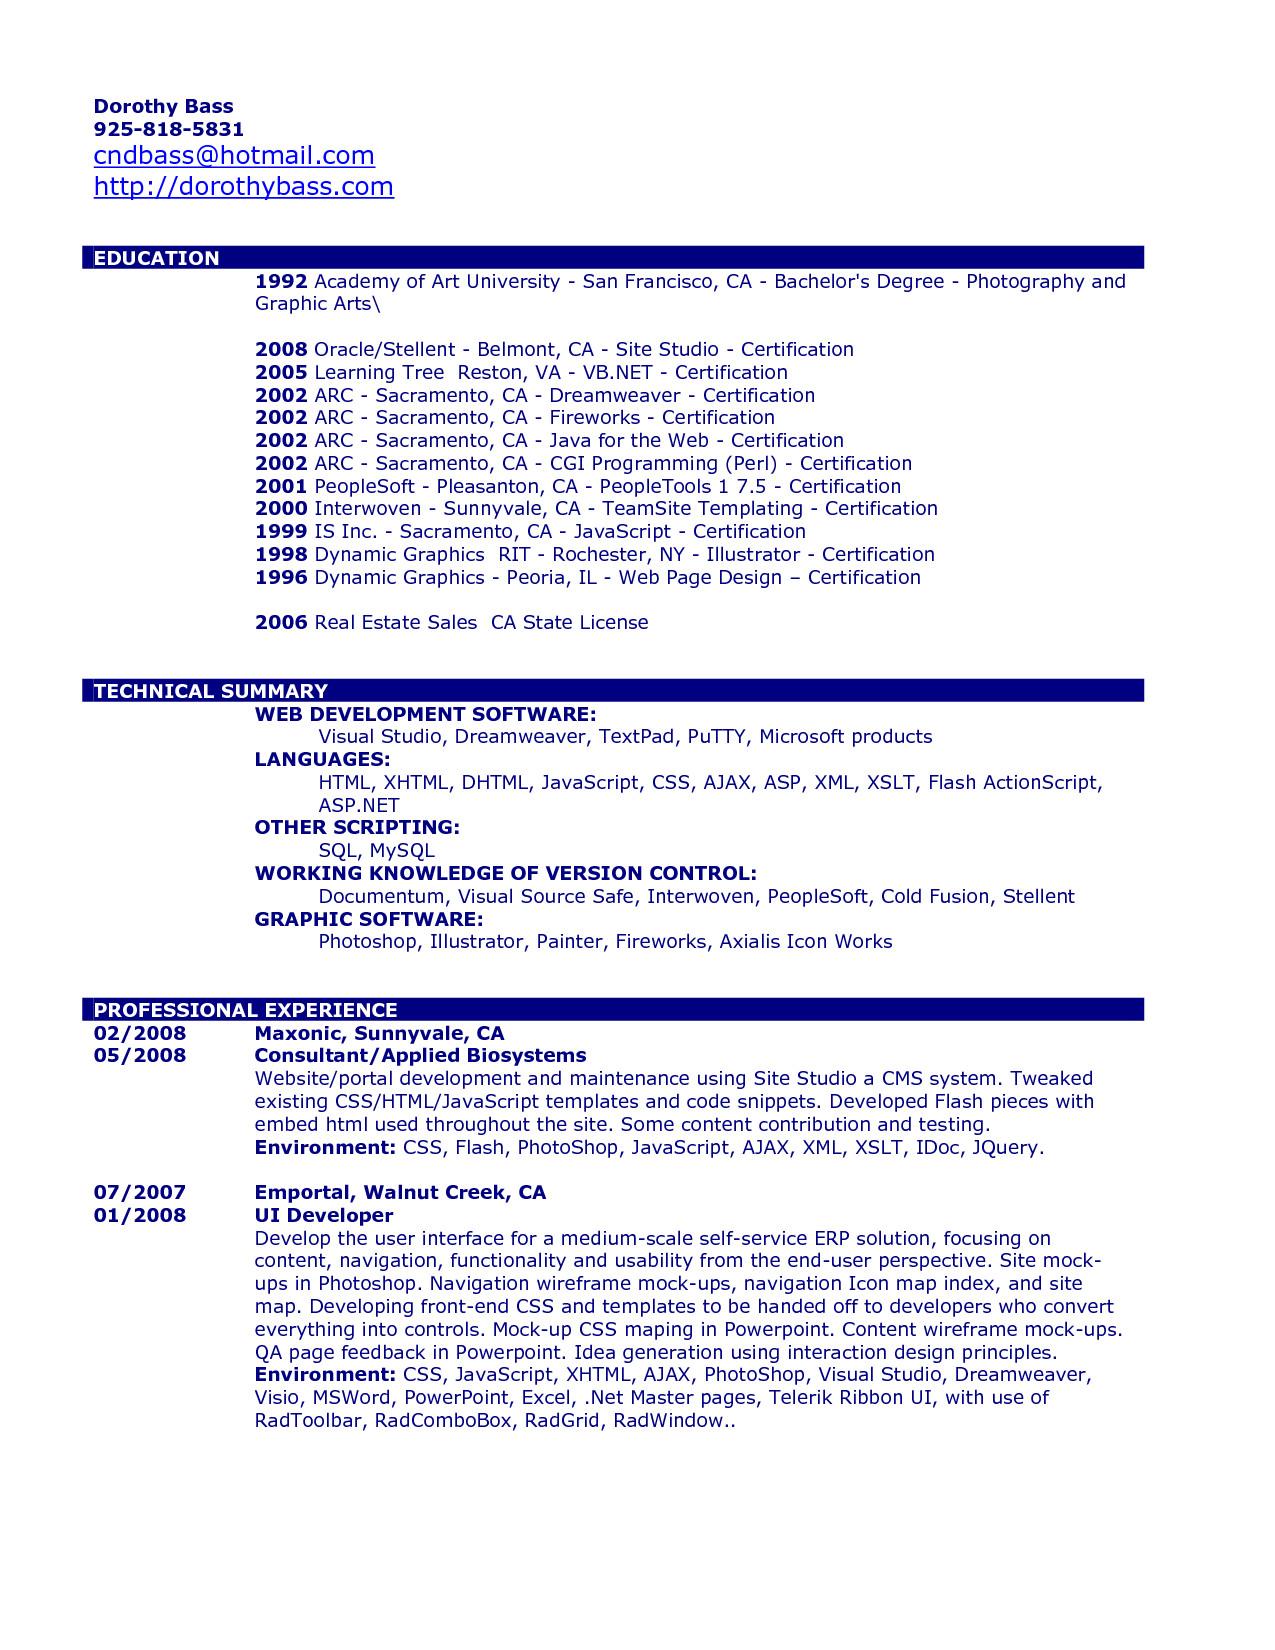 Google Drive Brochure Templates Google Drive Brochure Template Various Templates